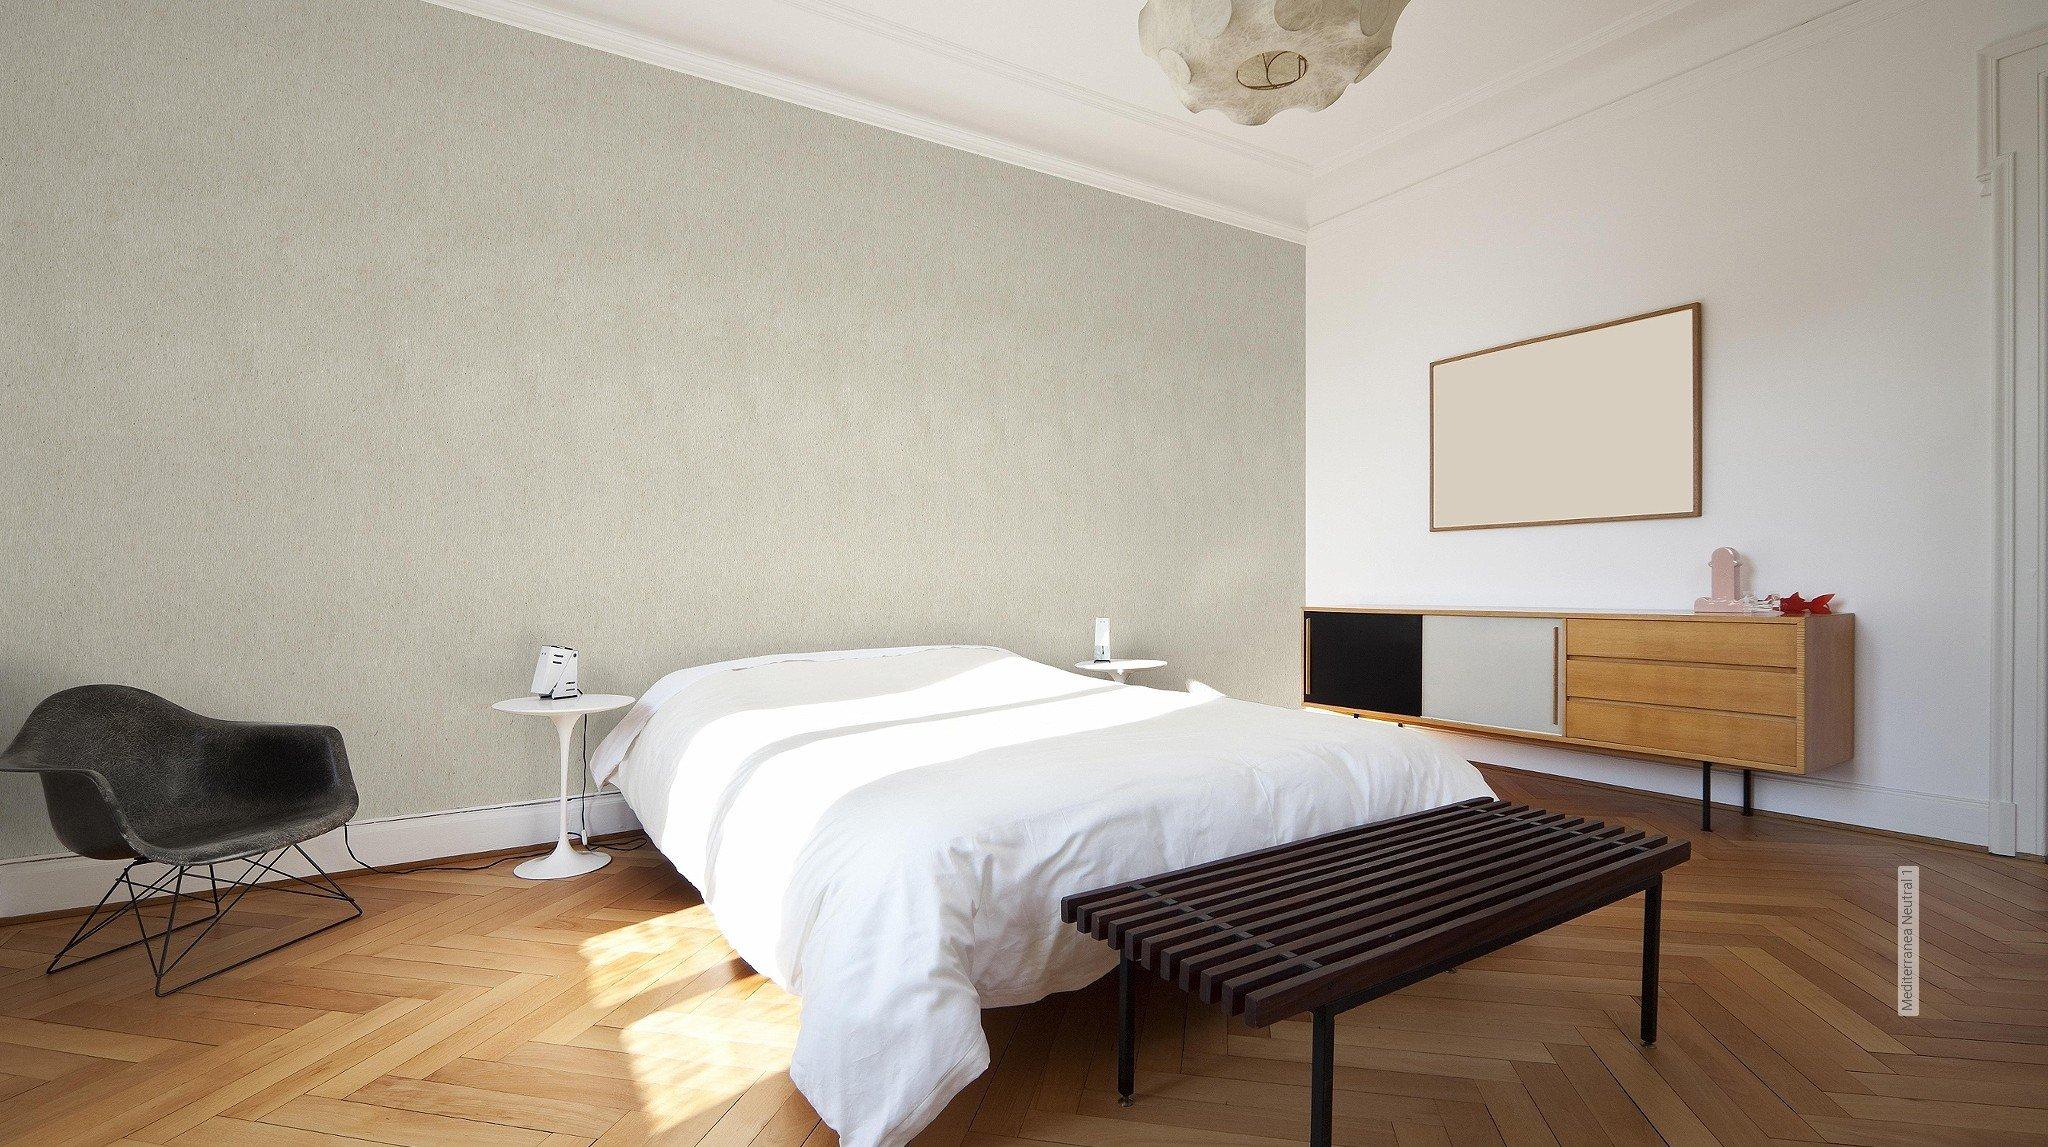 k chentapeten tapeten f r die k che die tapetenagentur. Black Bedroom Furniture Sets. Home Design Ideas